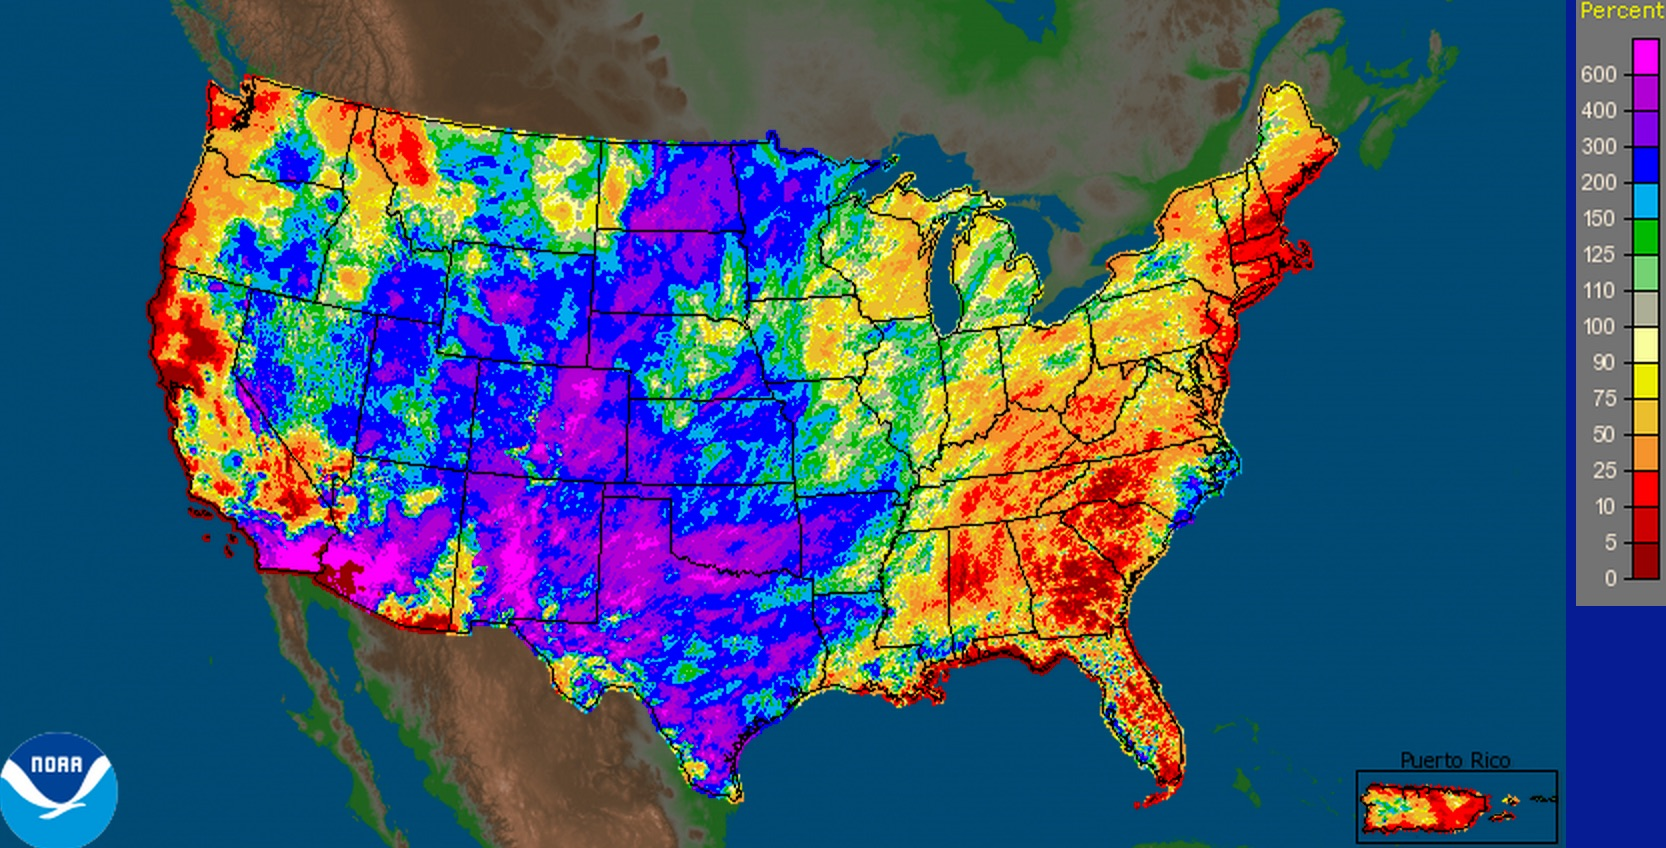 National Weather Service precipitation analysis